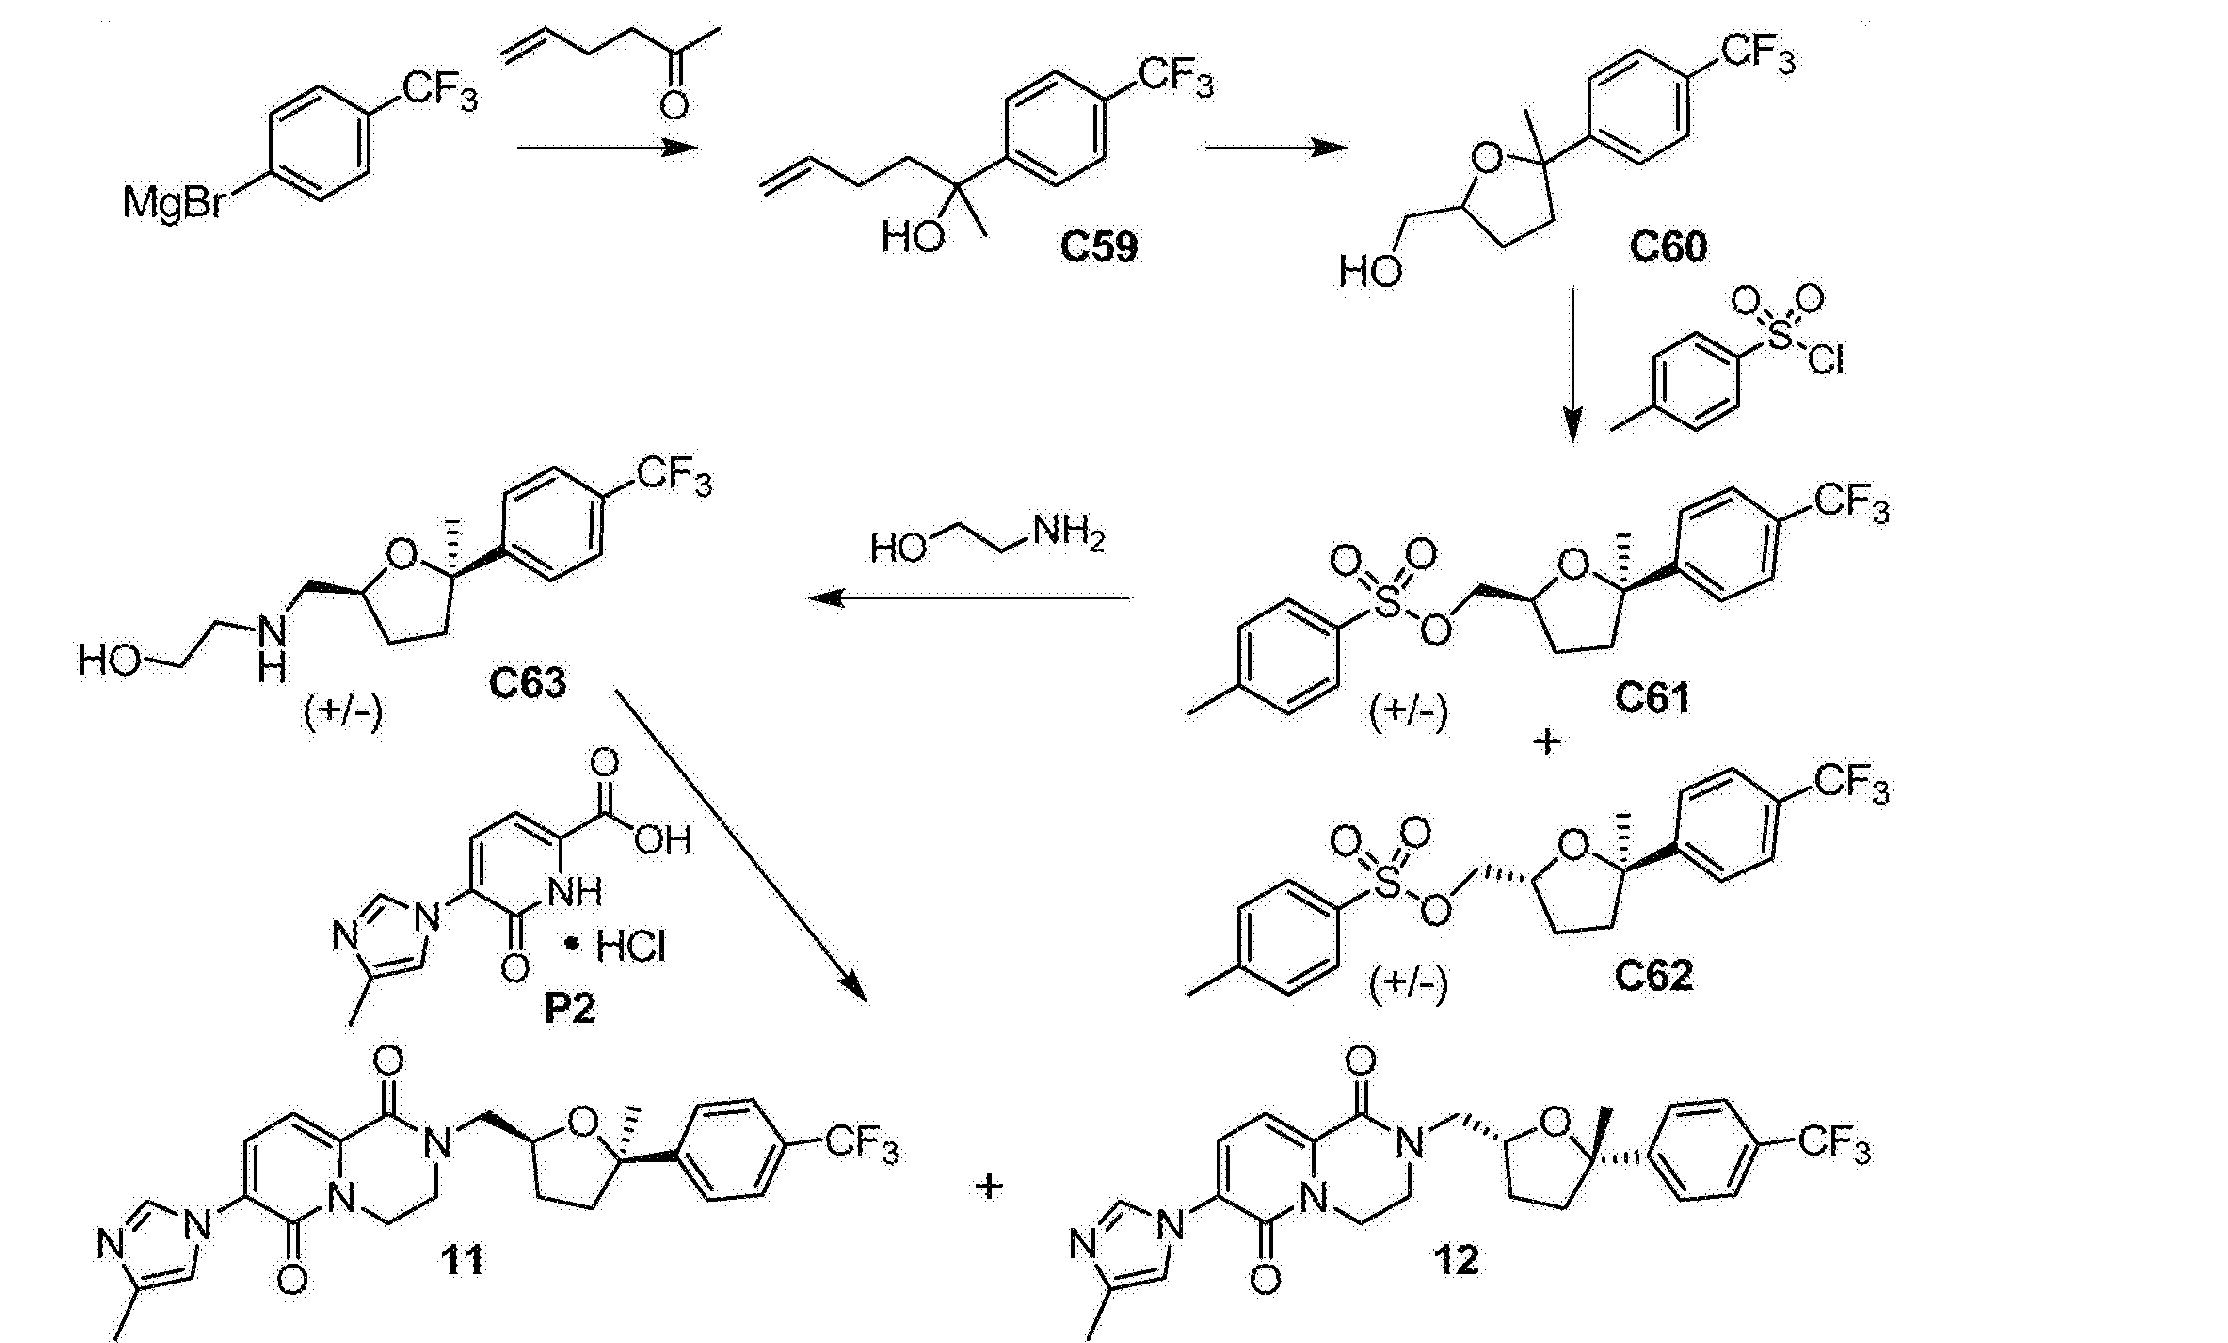 Cn104662021b New Bicyclic Pyridone Google Patents C61 Wiring Diagram Figure Cn104662021bd00601